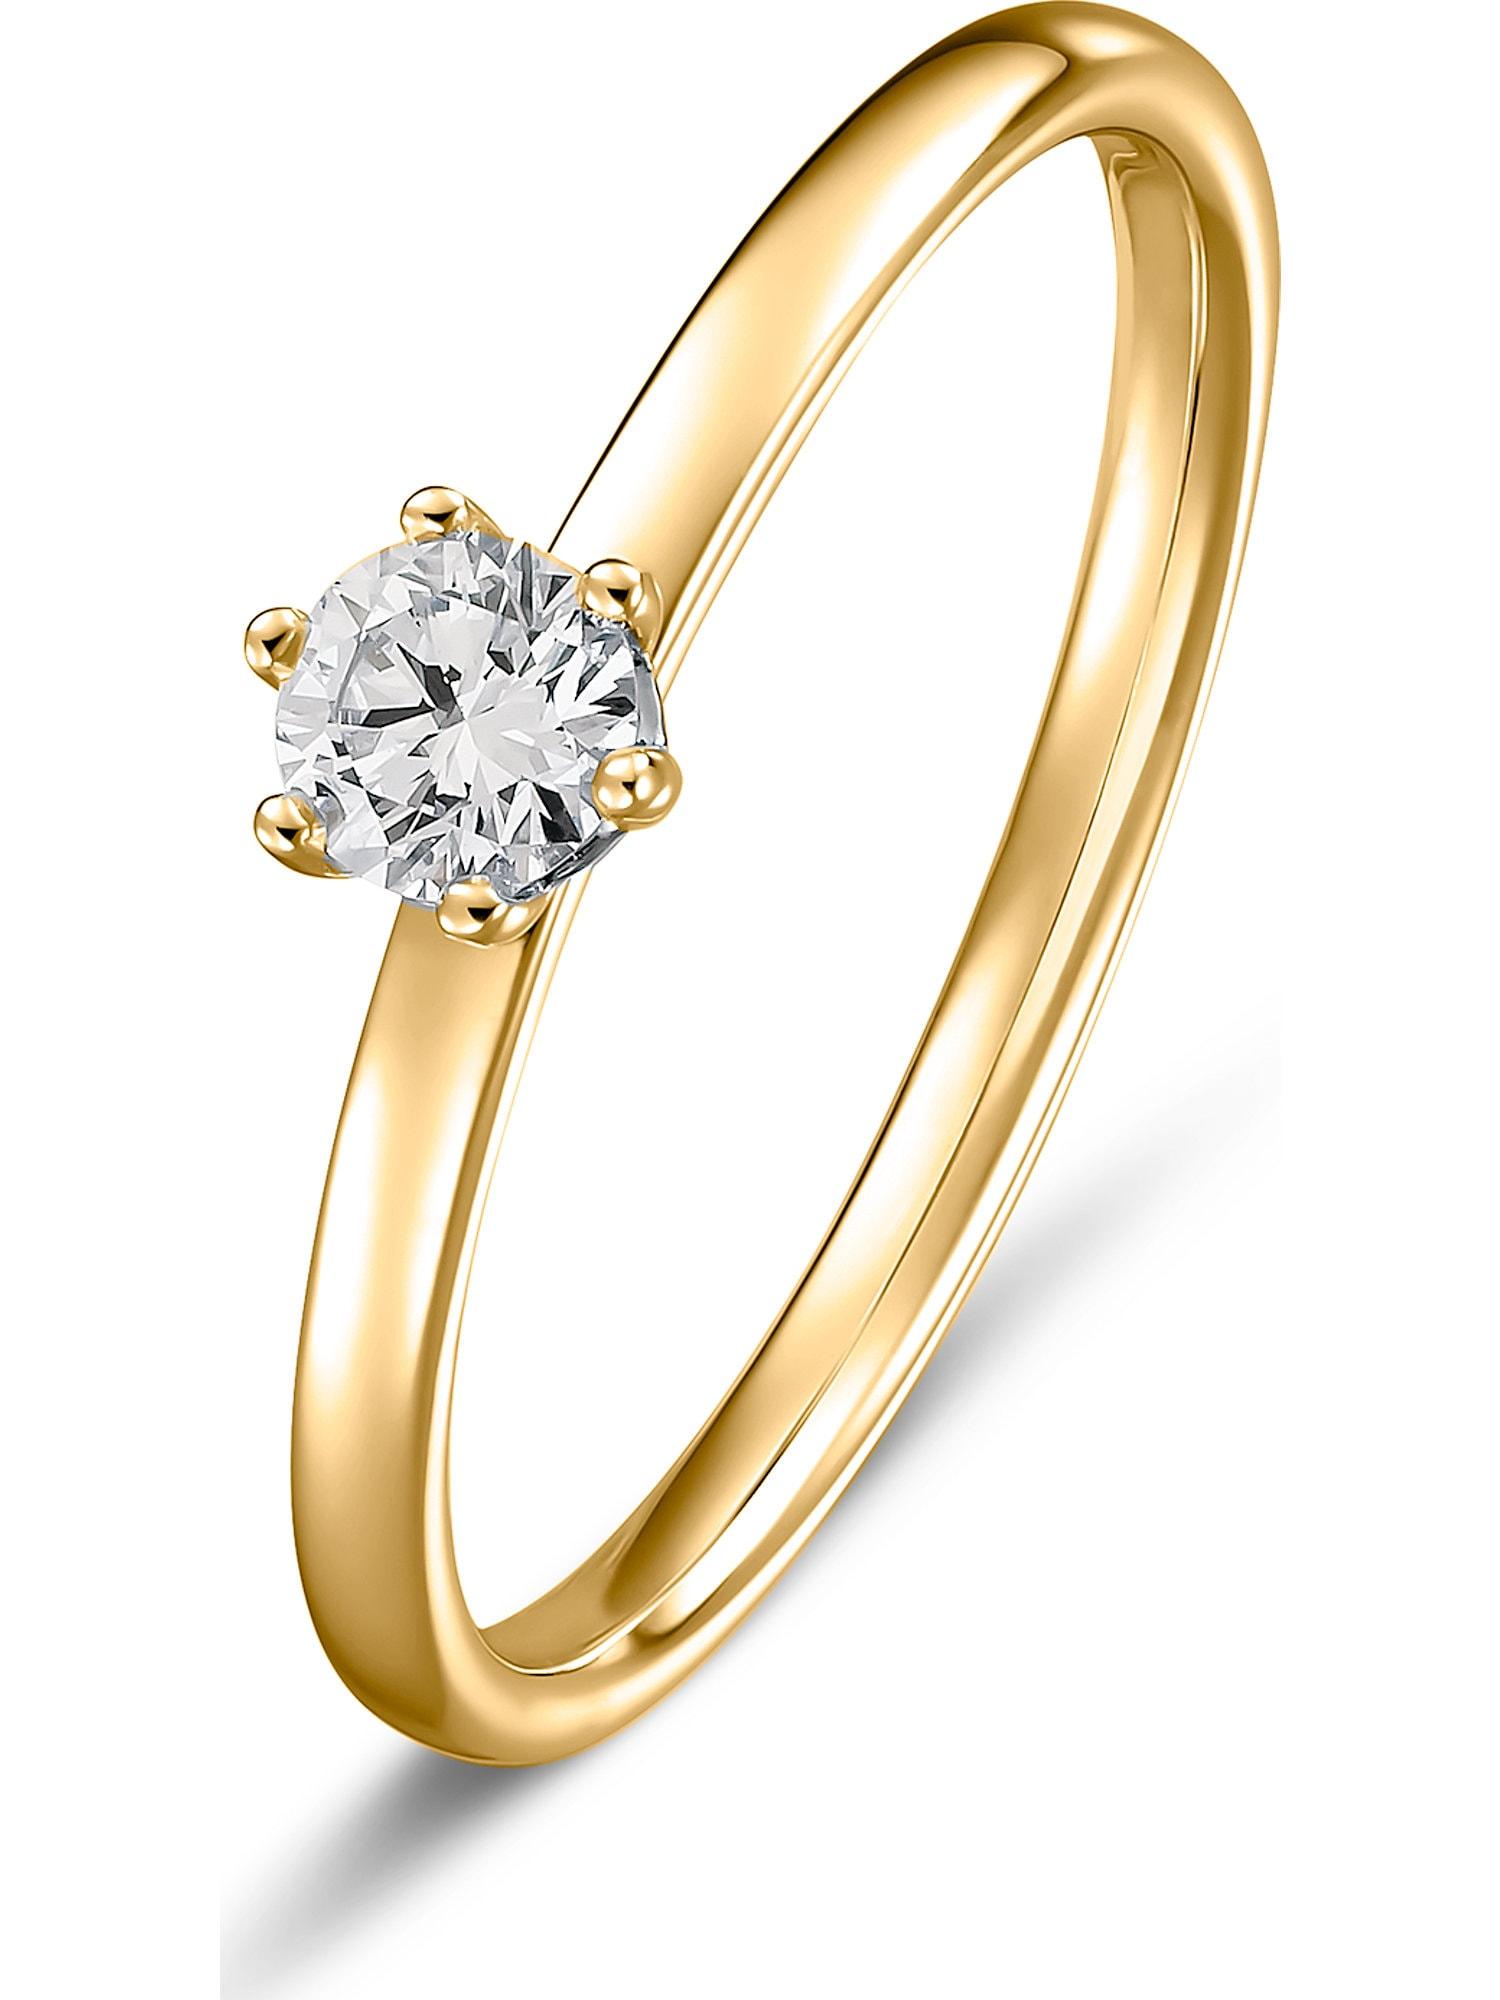 Damen Christ Ring gold, schwarz | 04043145885305